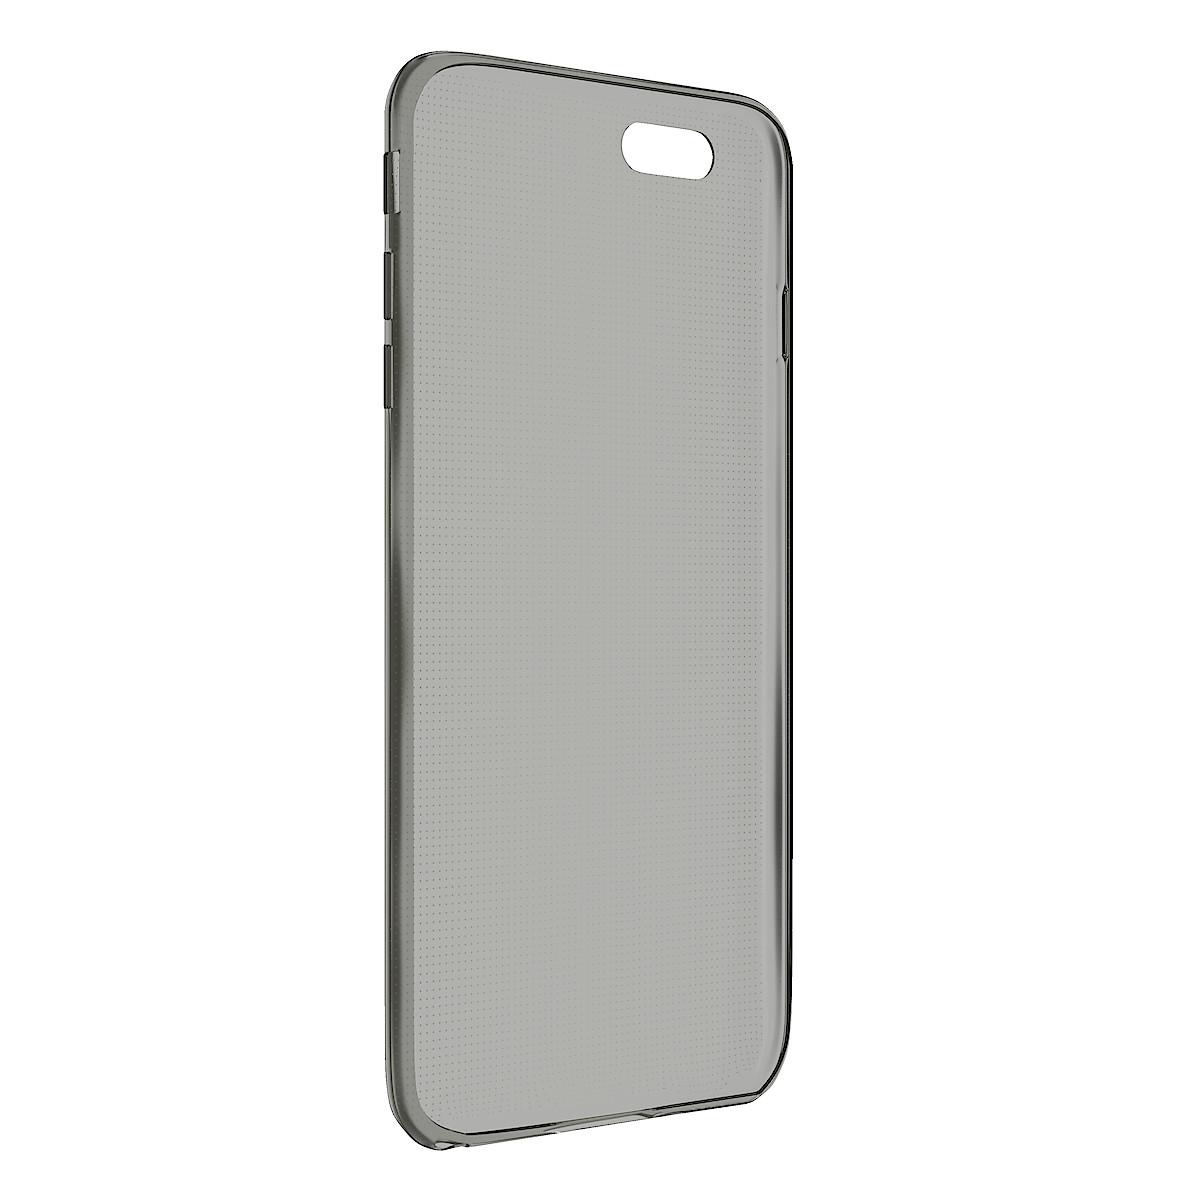 Easy-Grip Mobile Phone Case for iPhone 6 Plus/6S Plus